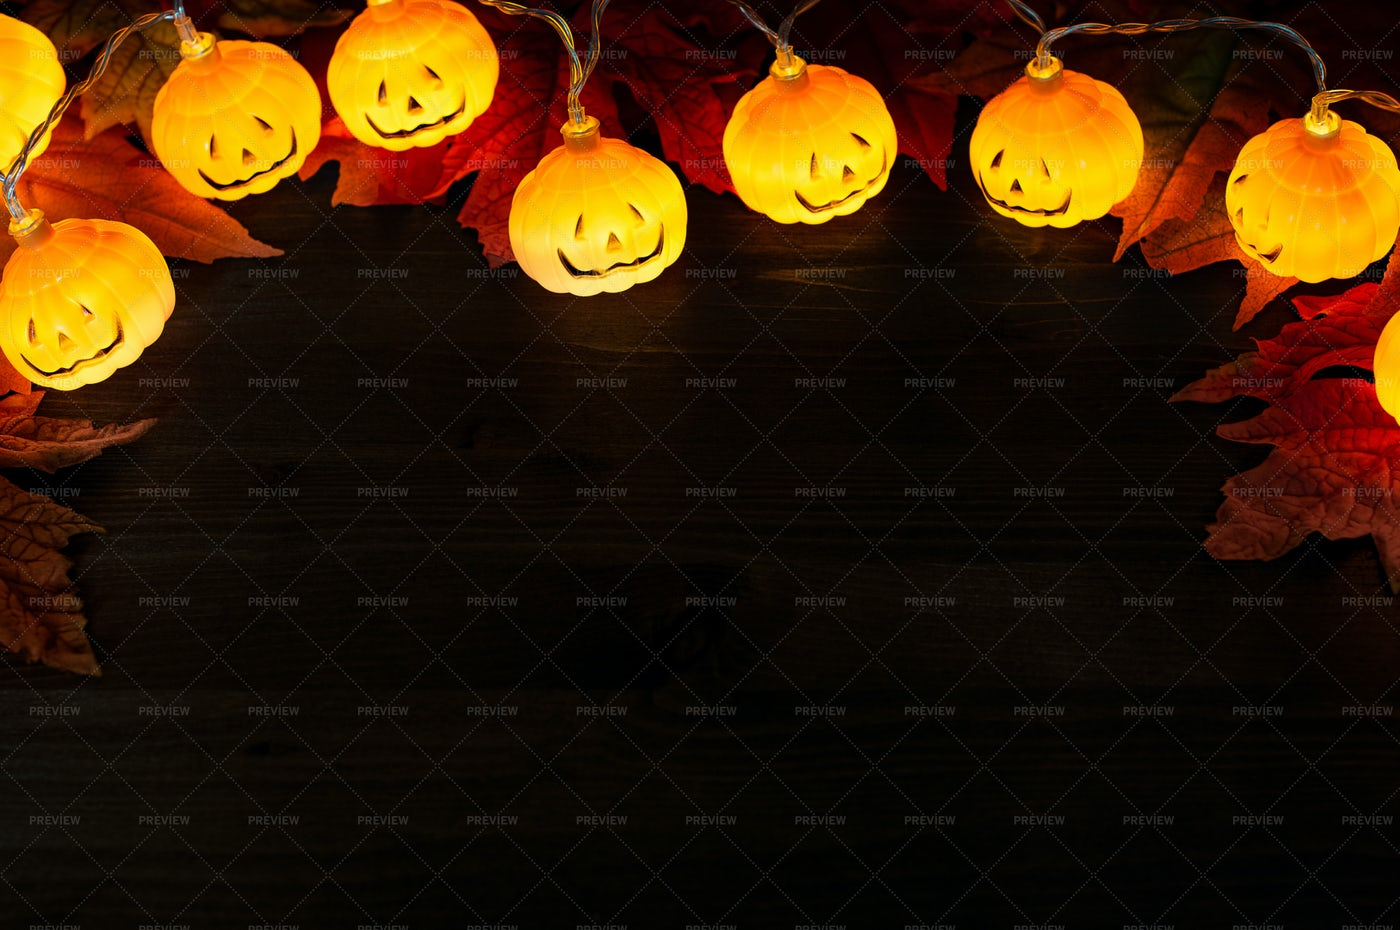 Garland Of Halloween Pumpkins: Stock Photos